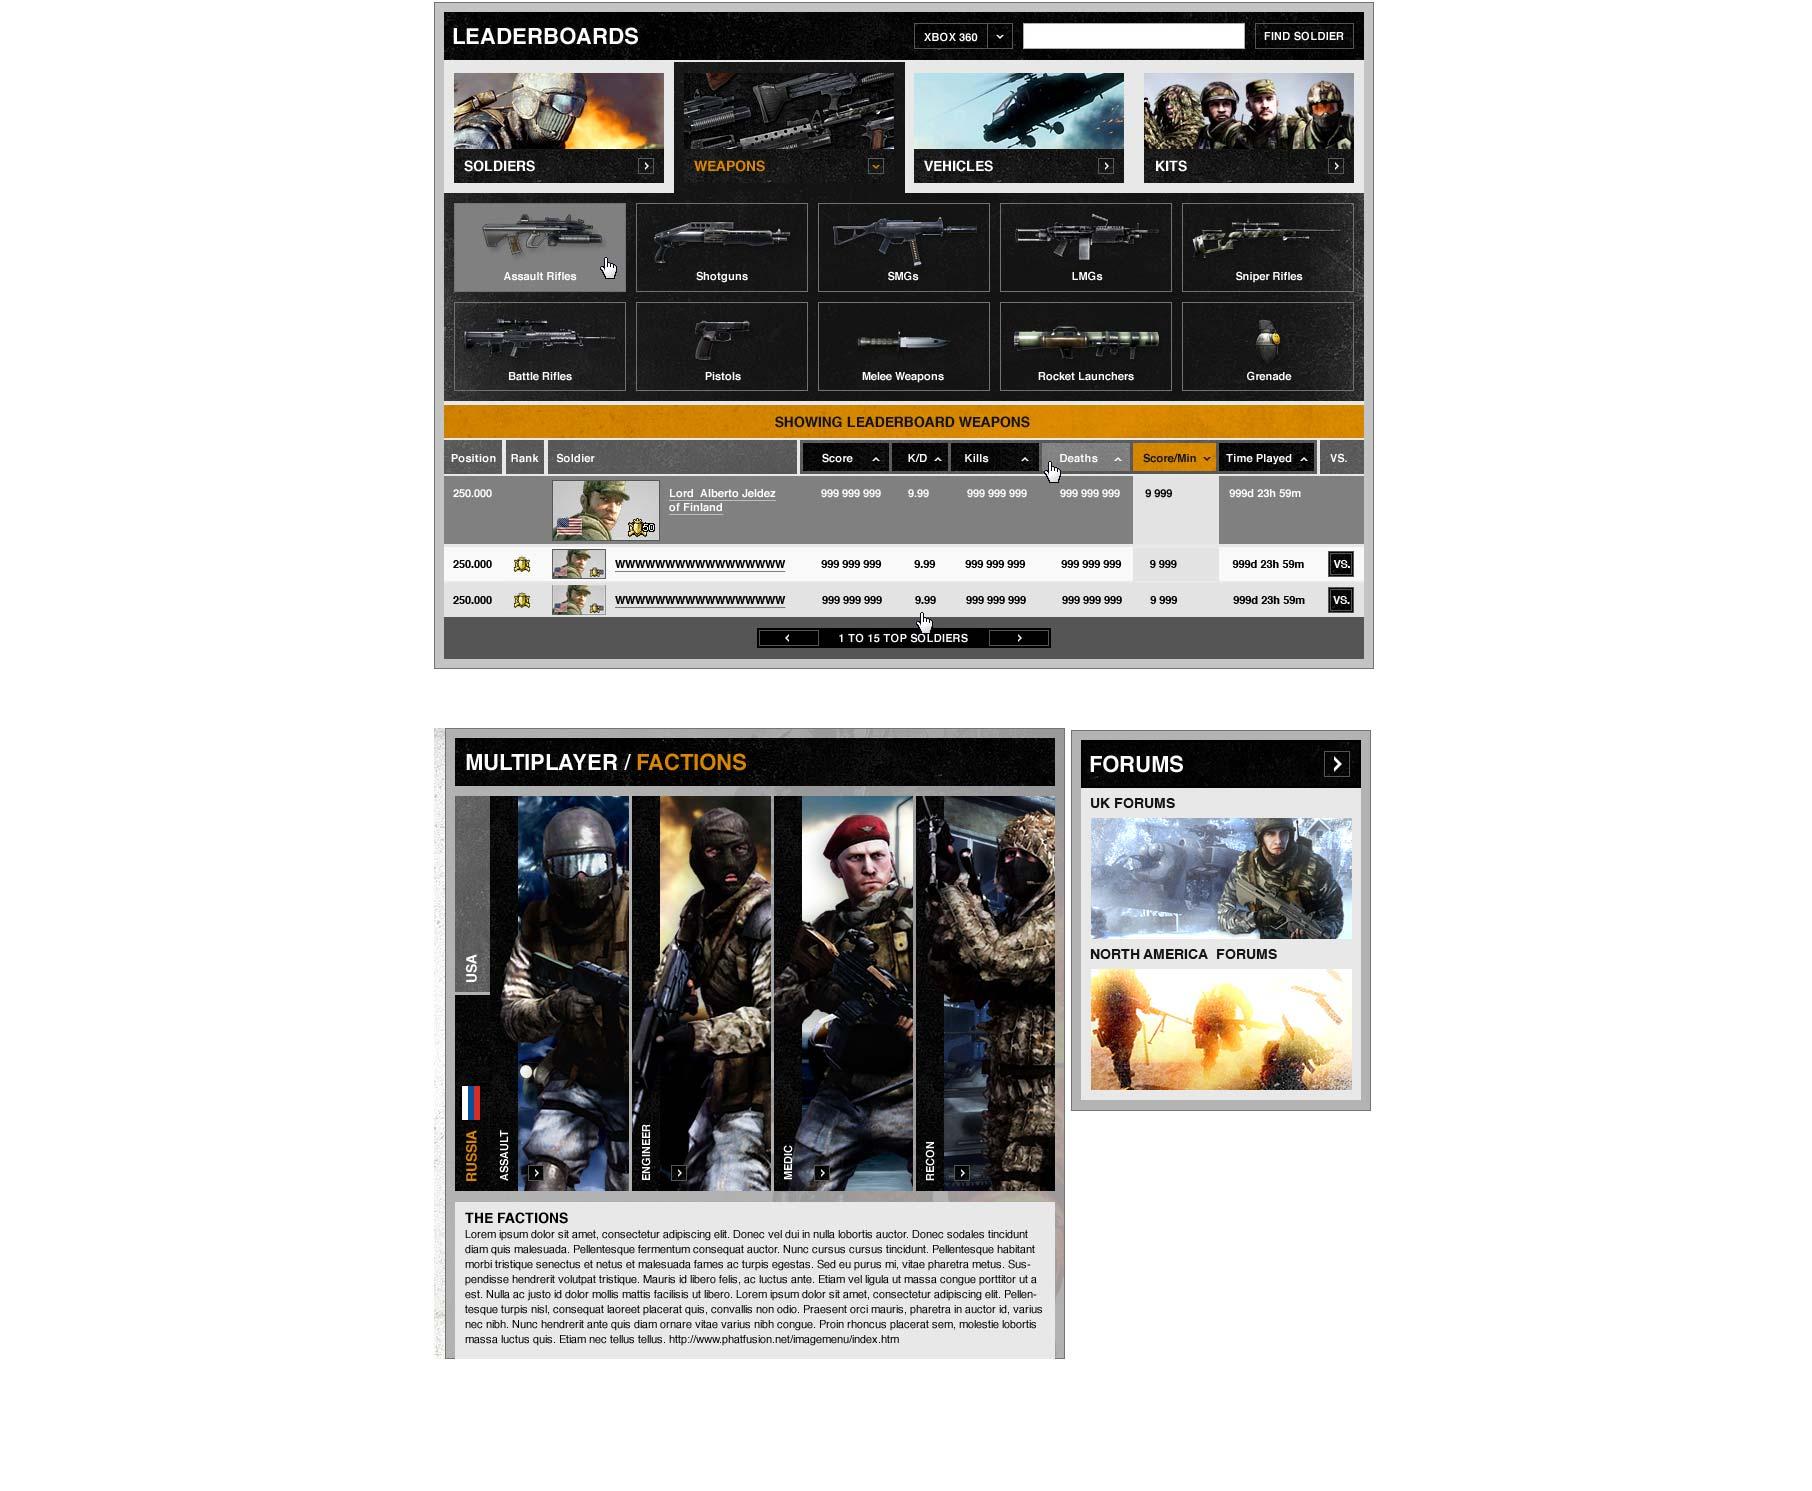 Battlefield Bad Company 2 interface misc.